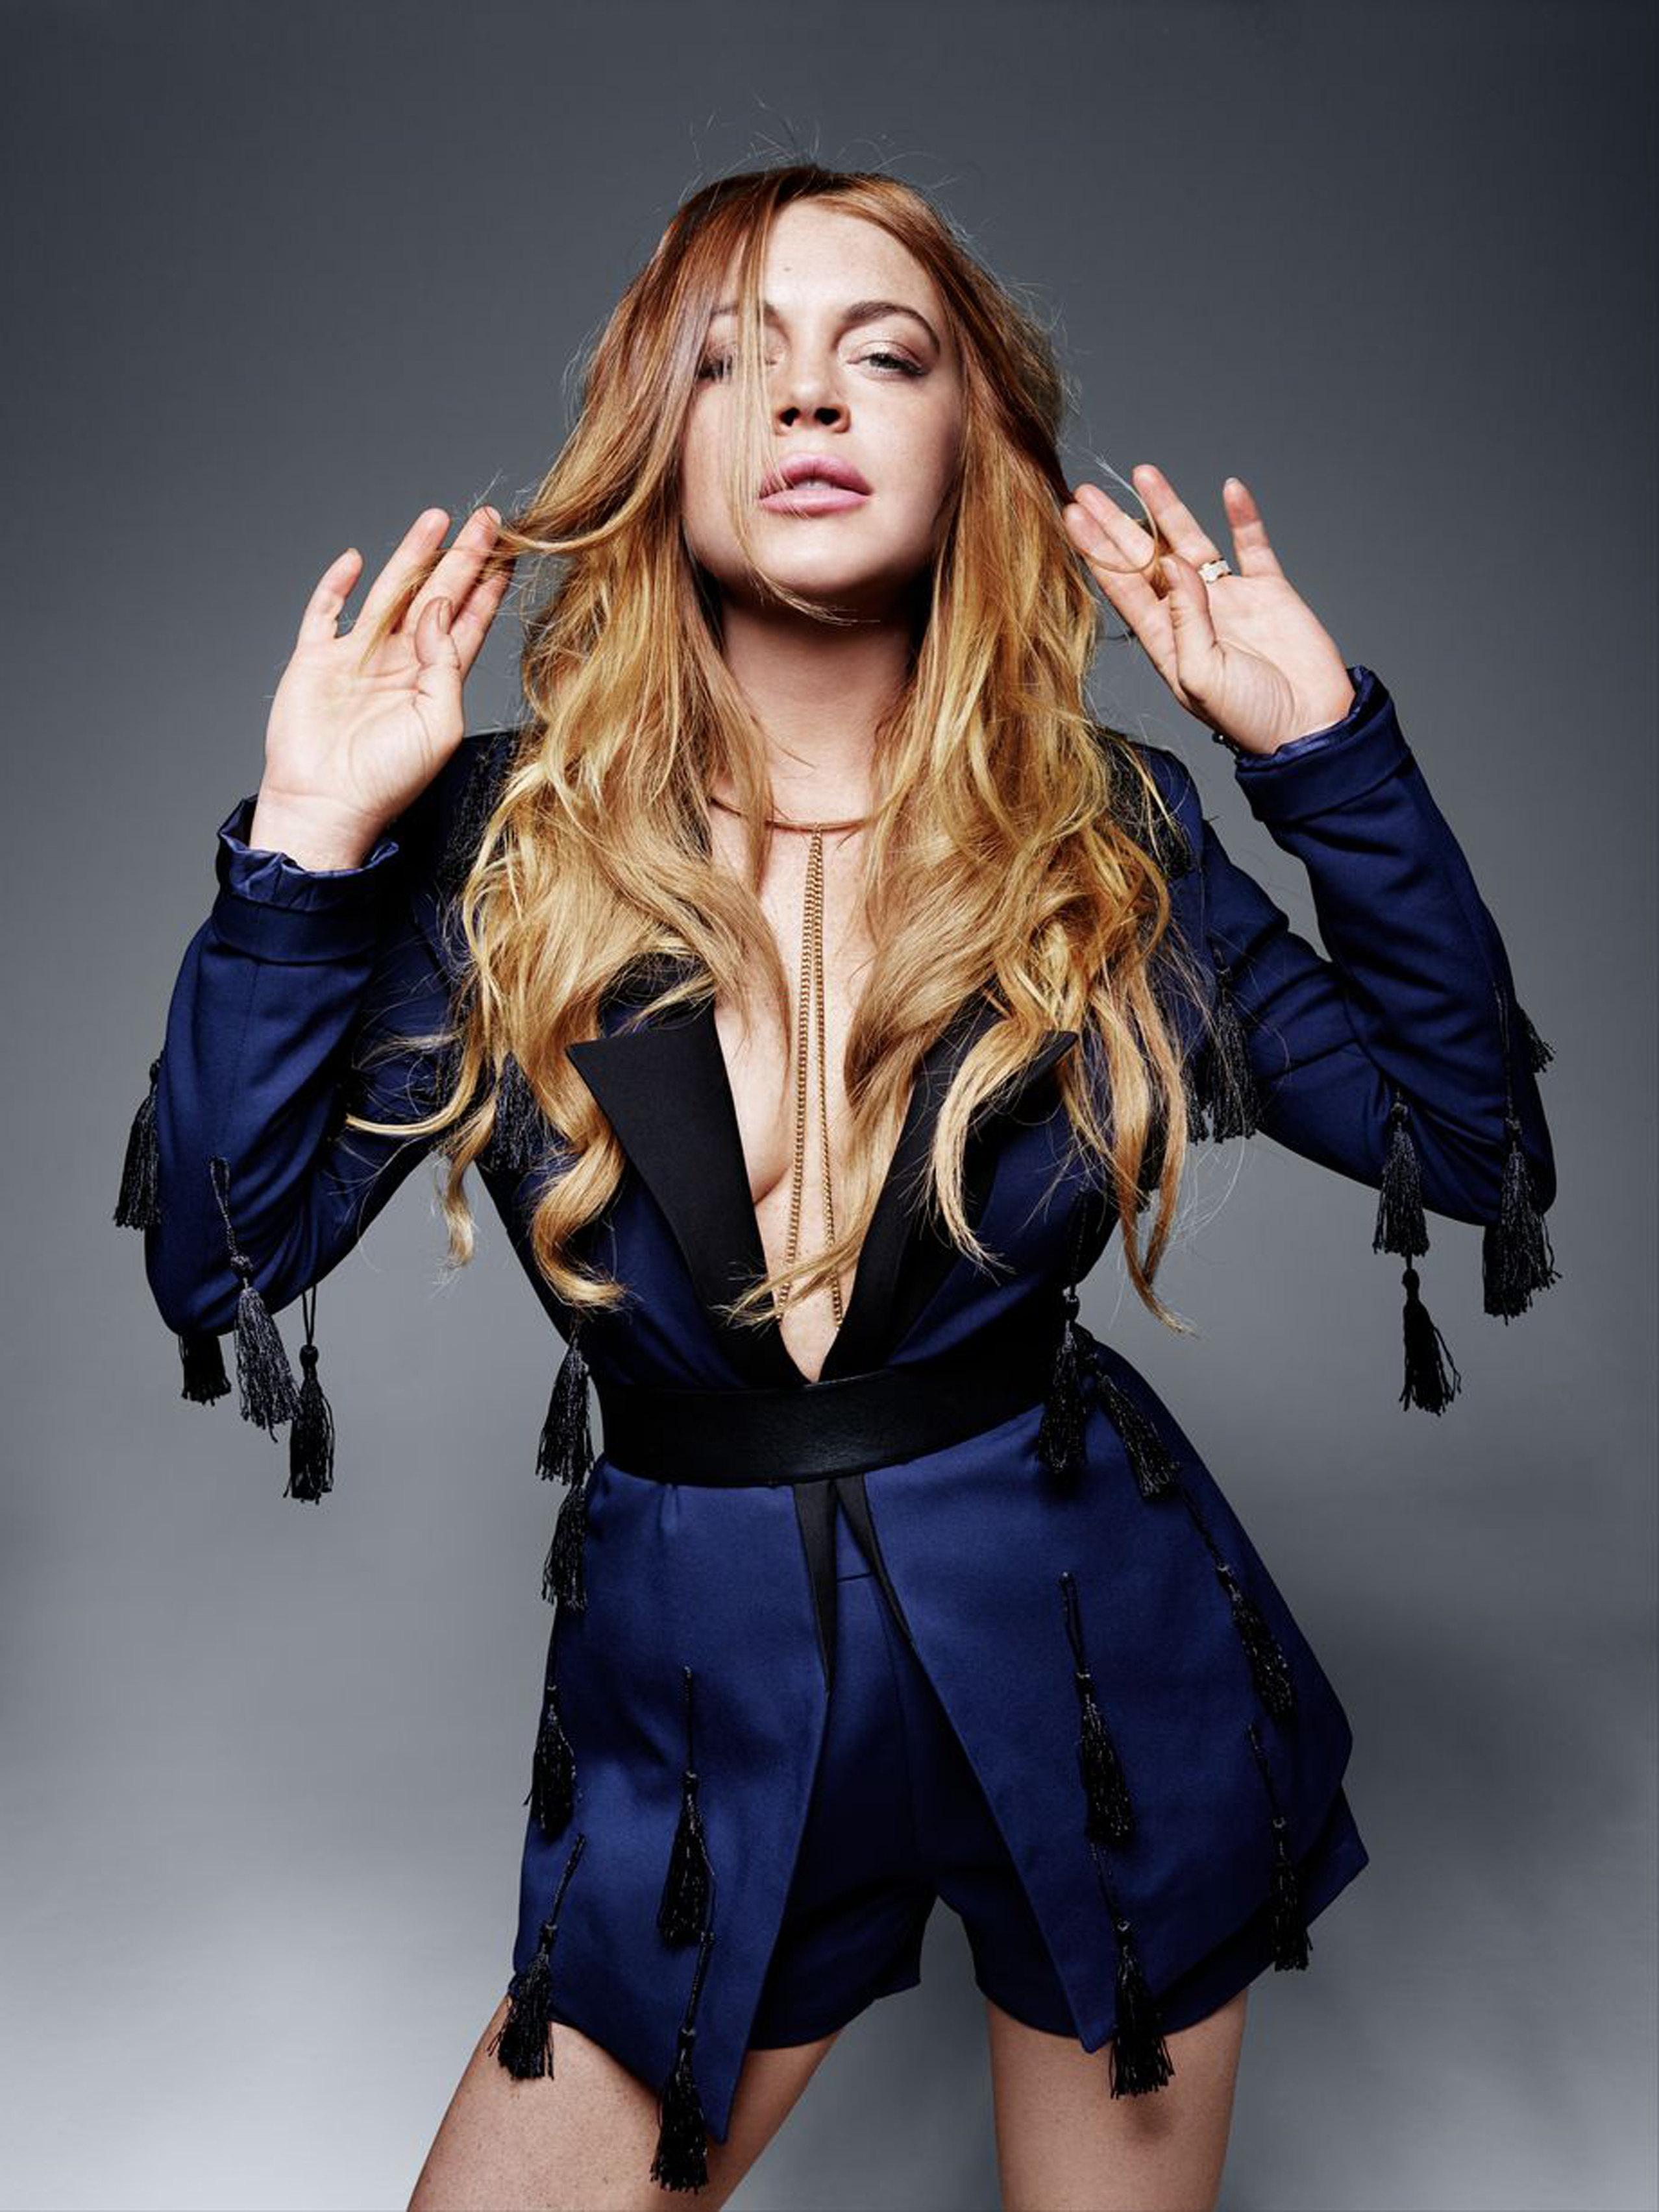 Lindsay Lohan - Lavish Alice Photoshoot (June 2015)